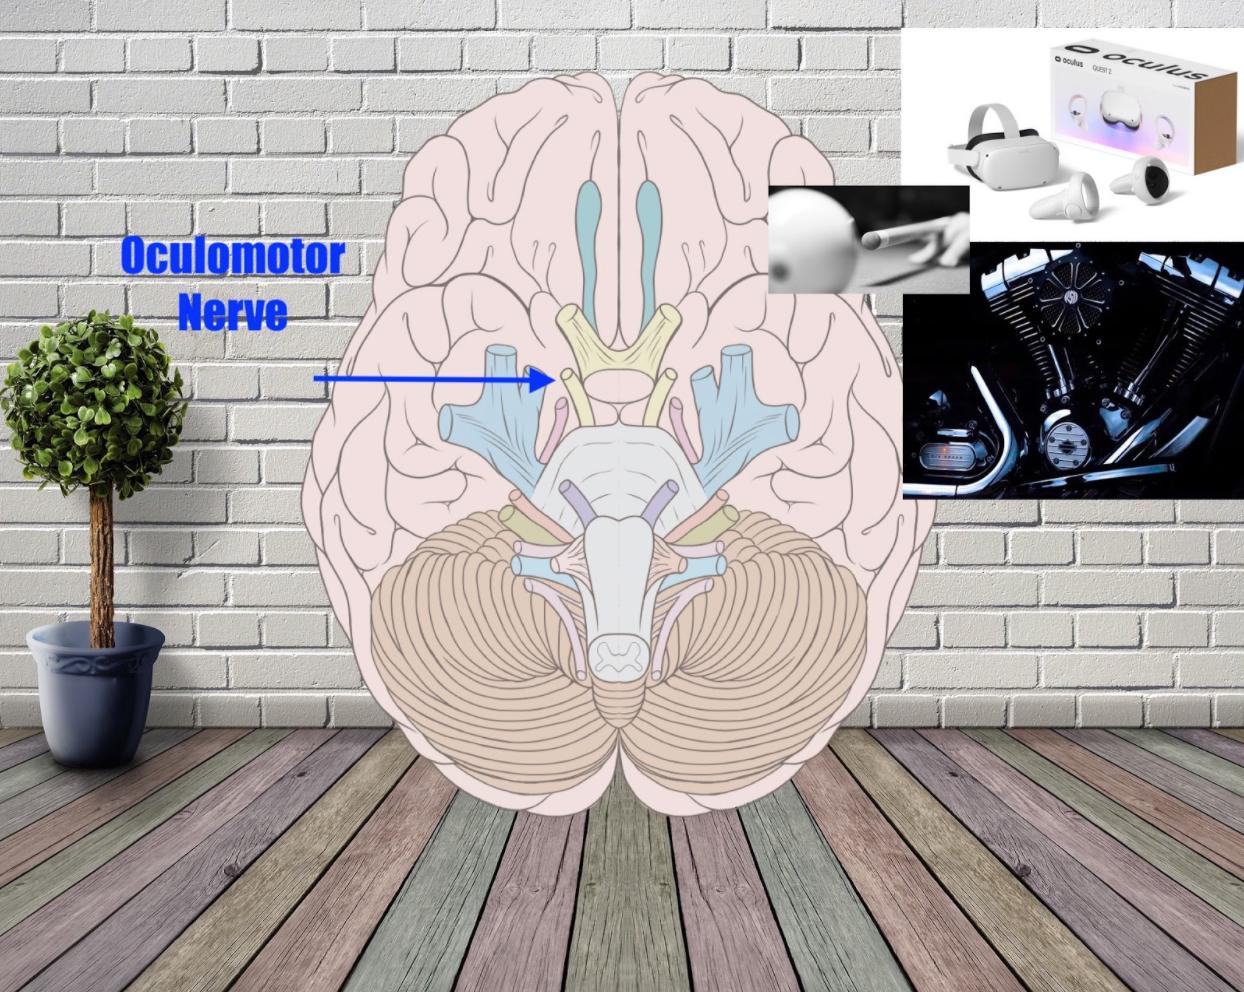 oculomotor nerve example